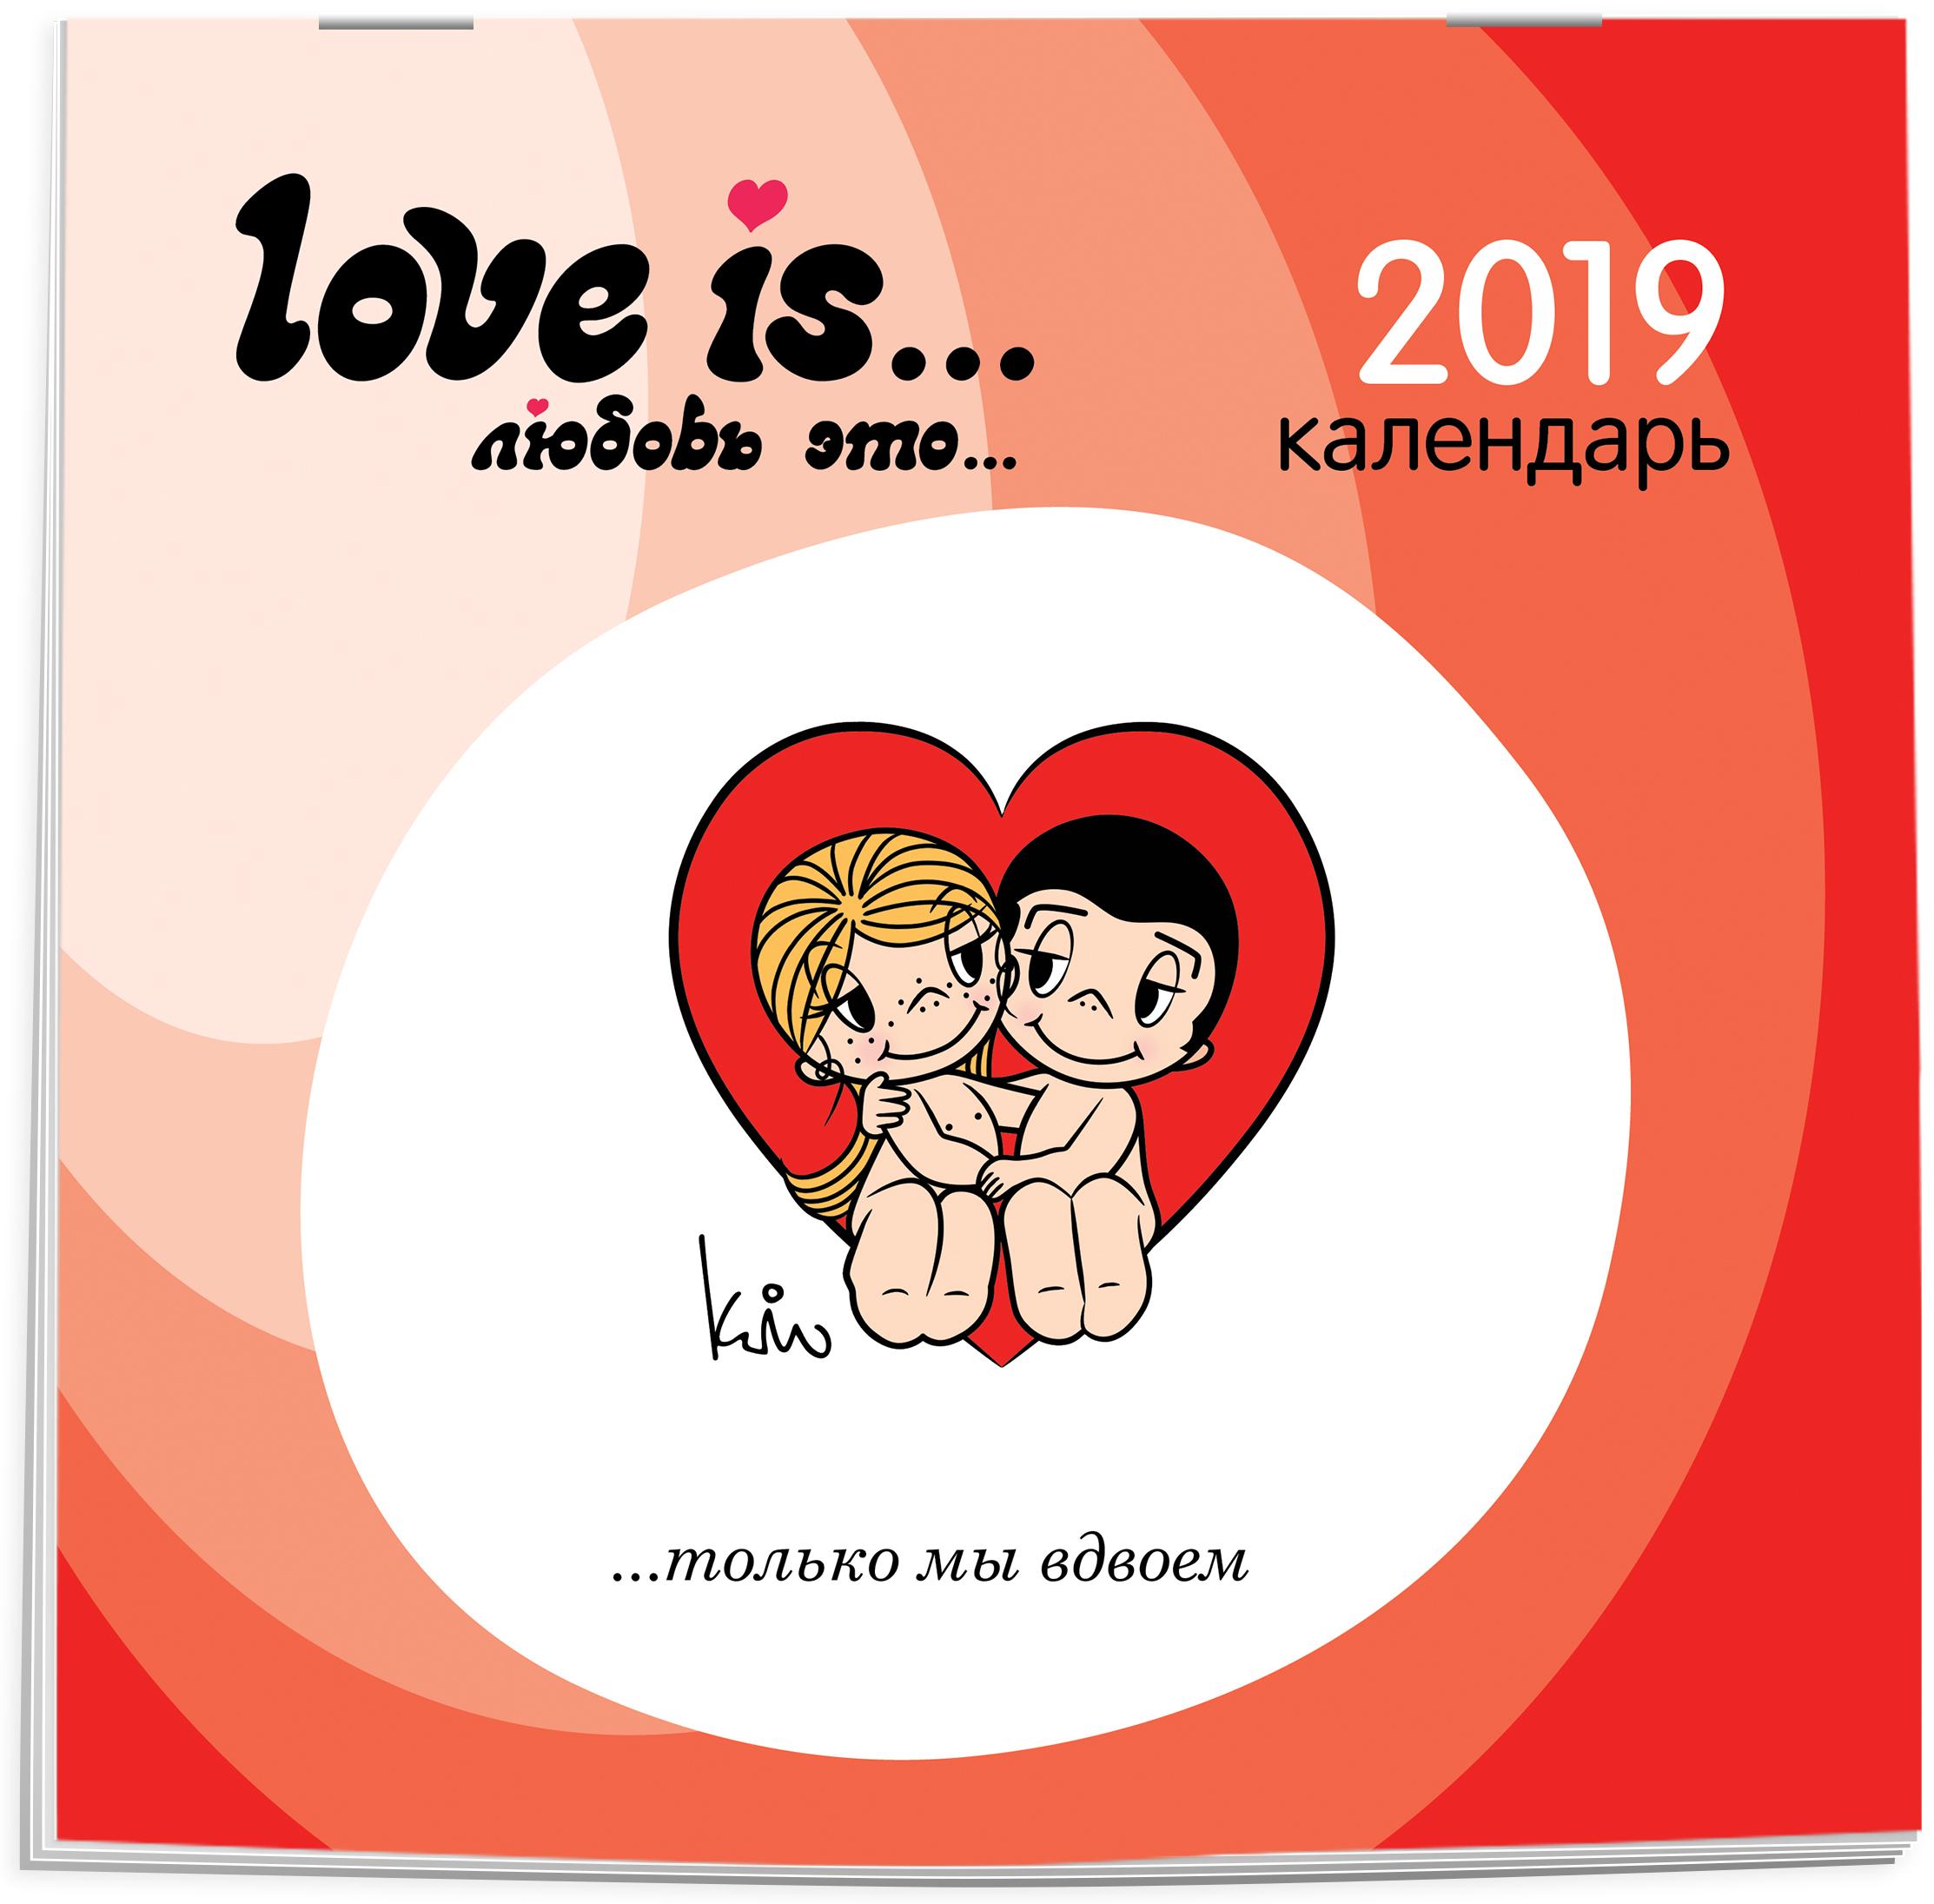 Гапчинская Е. Love is... Календарь настенный на 2019 год (Арте)